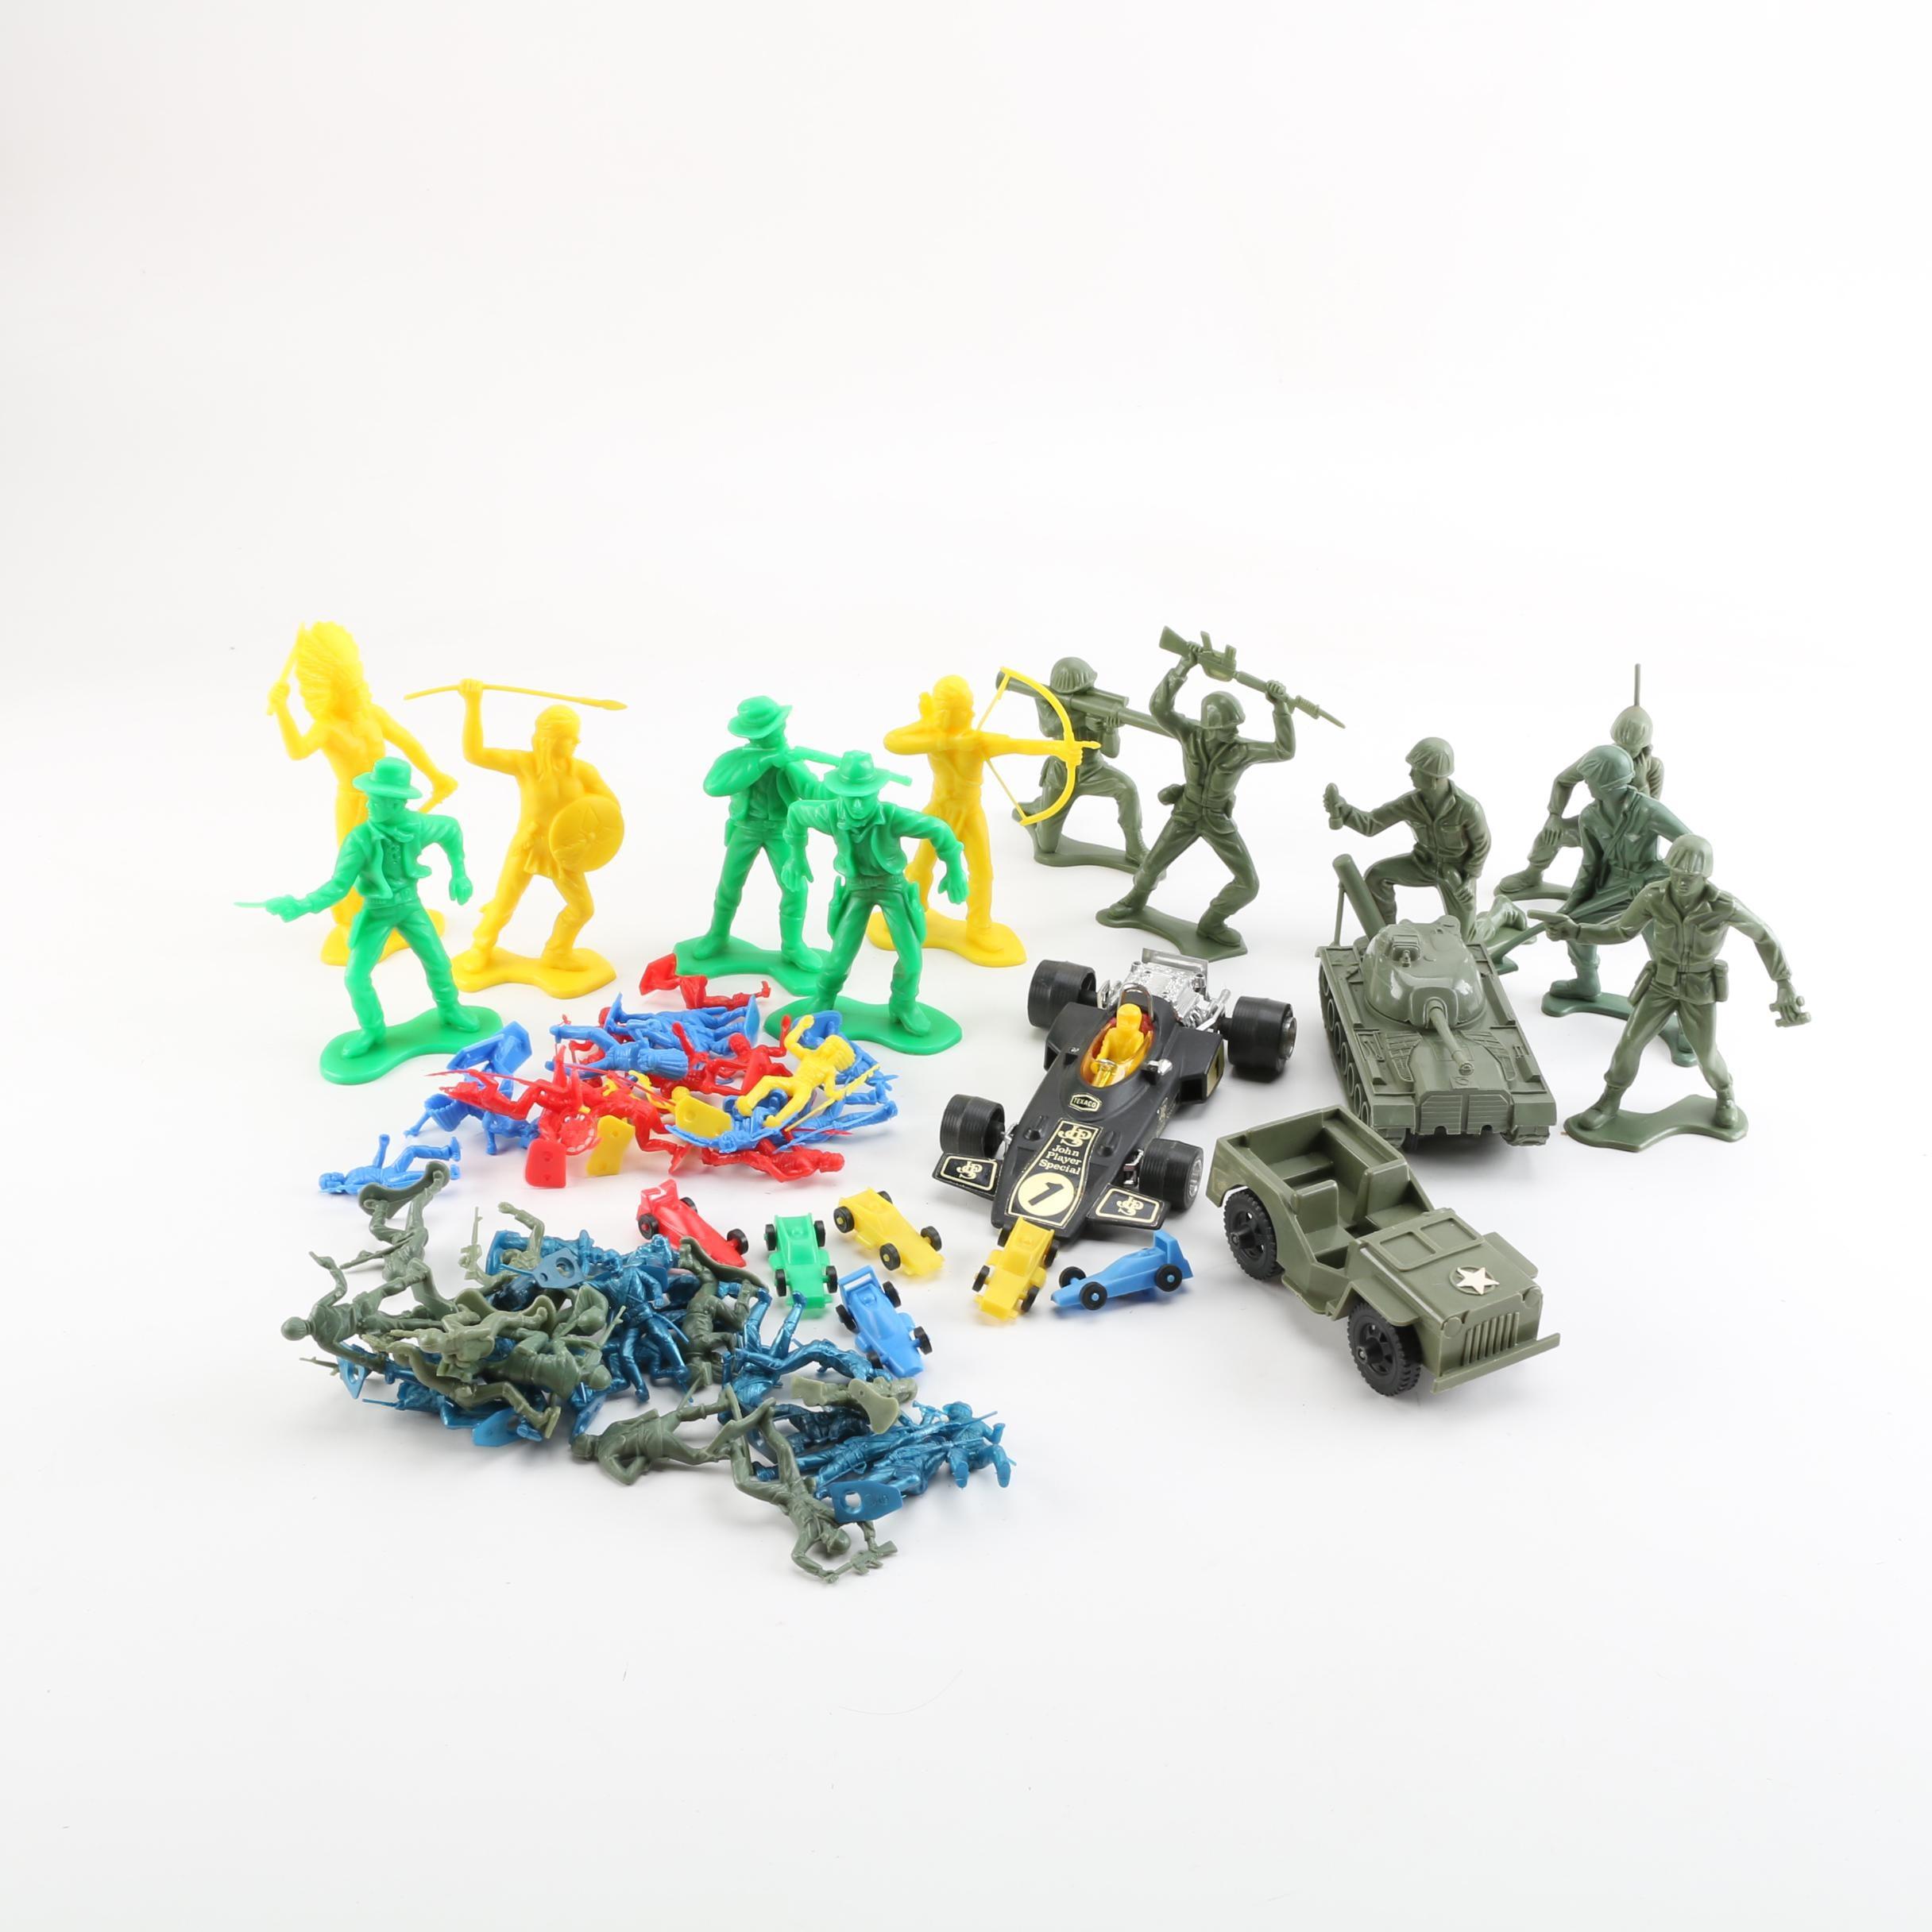 Plastic Pretend Toys, Including Lotus JP8 F1 Vehicle